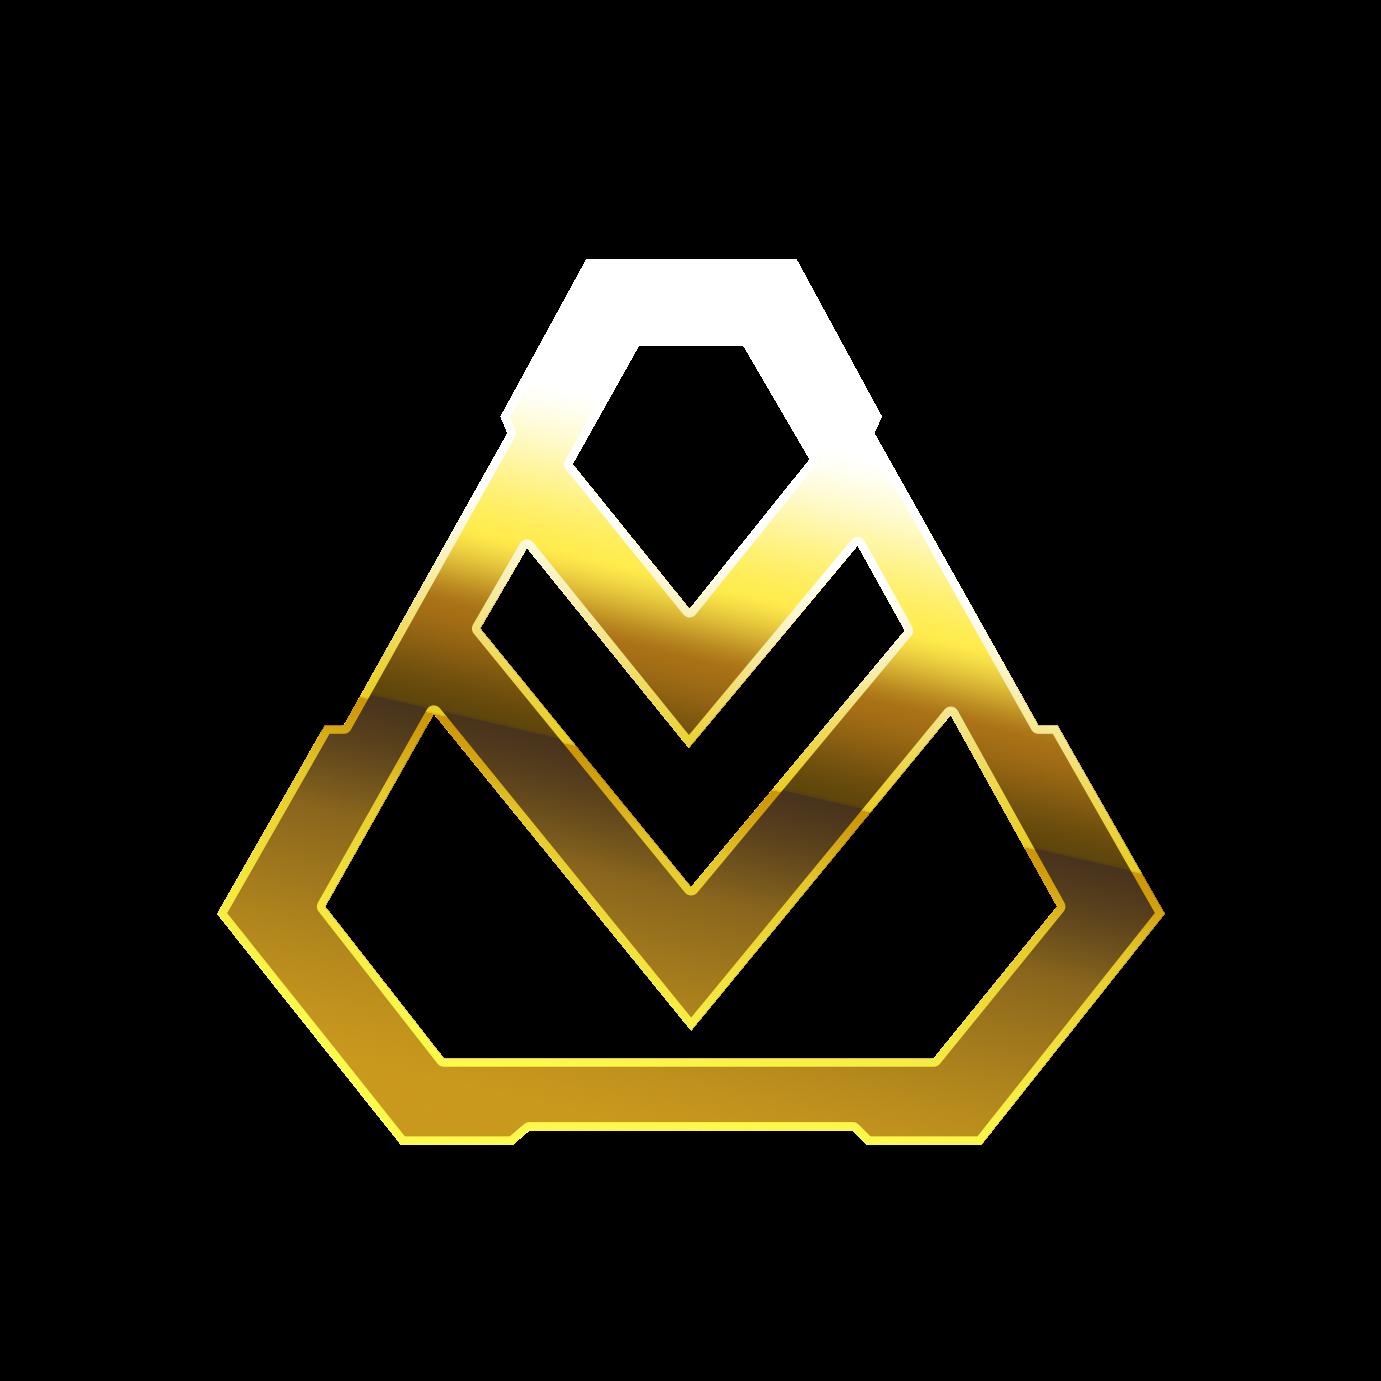 Fortnite Ranks Google Search Badge Design Military Ranks Badge